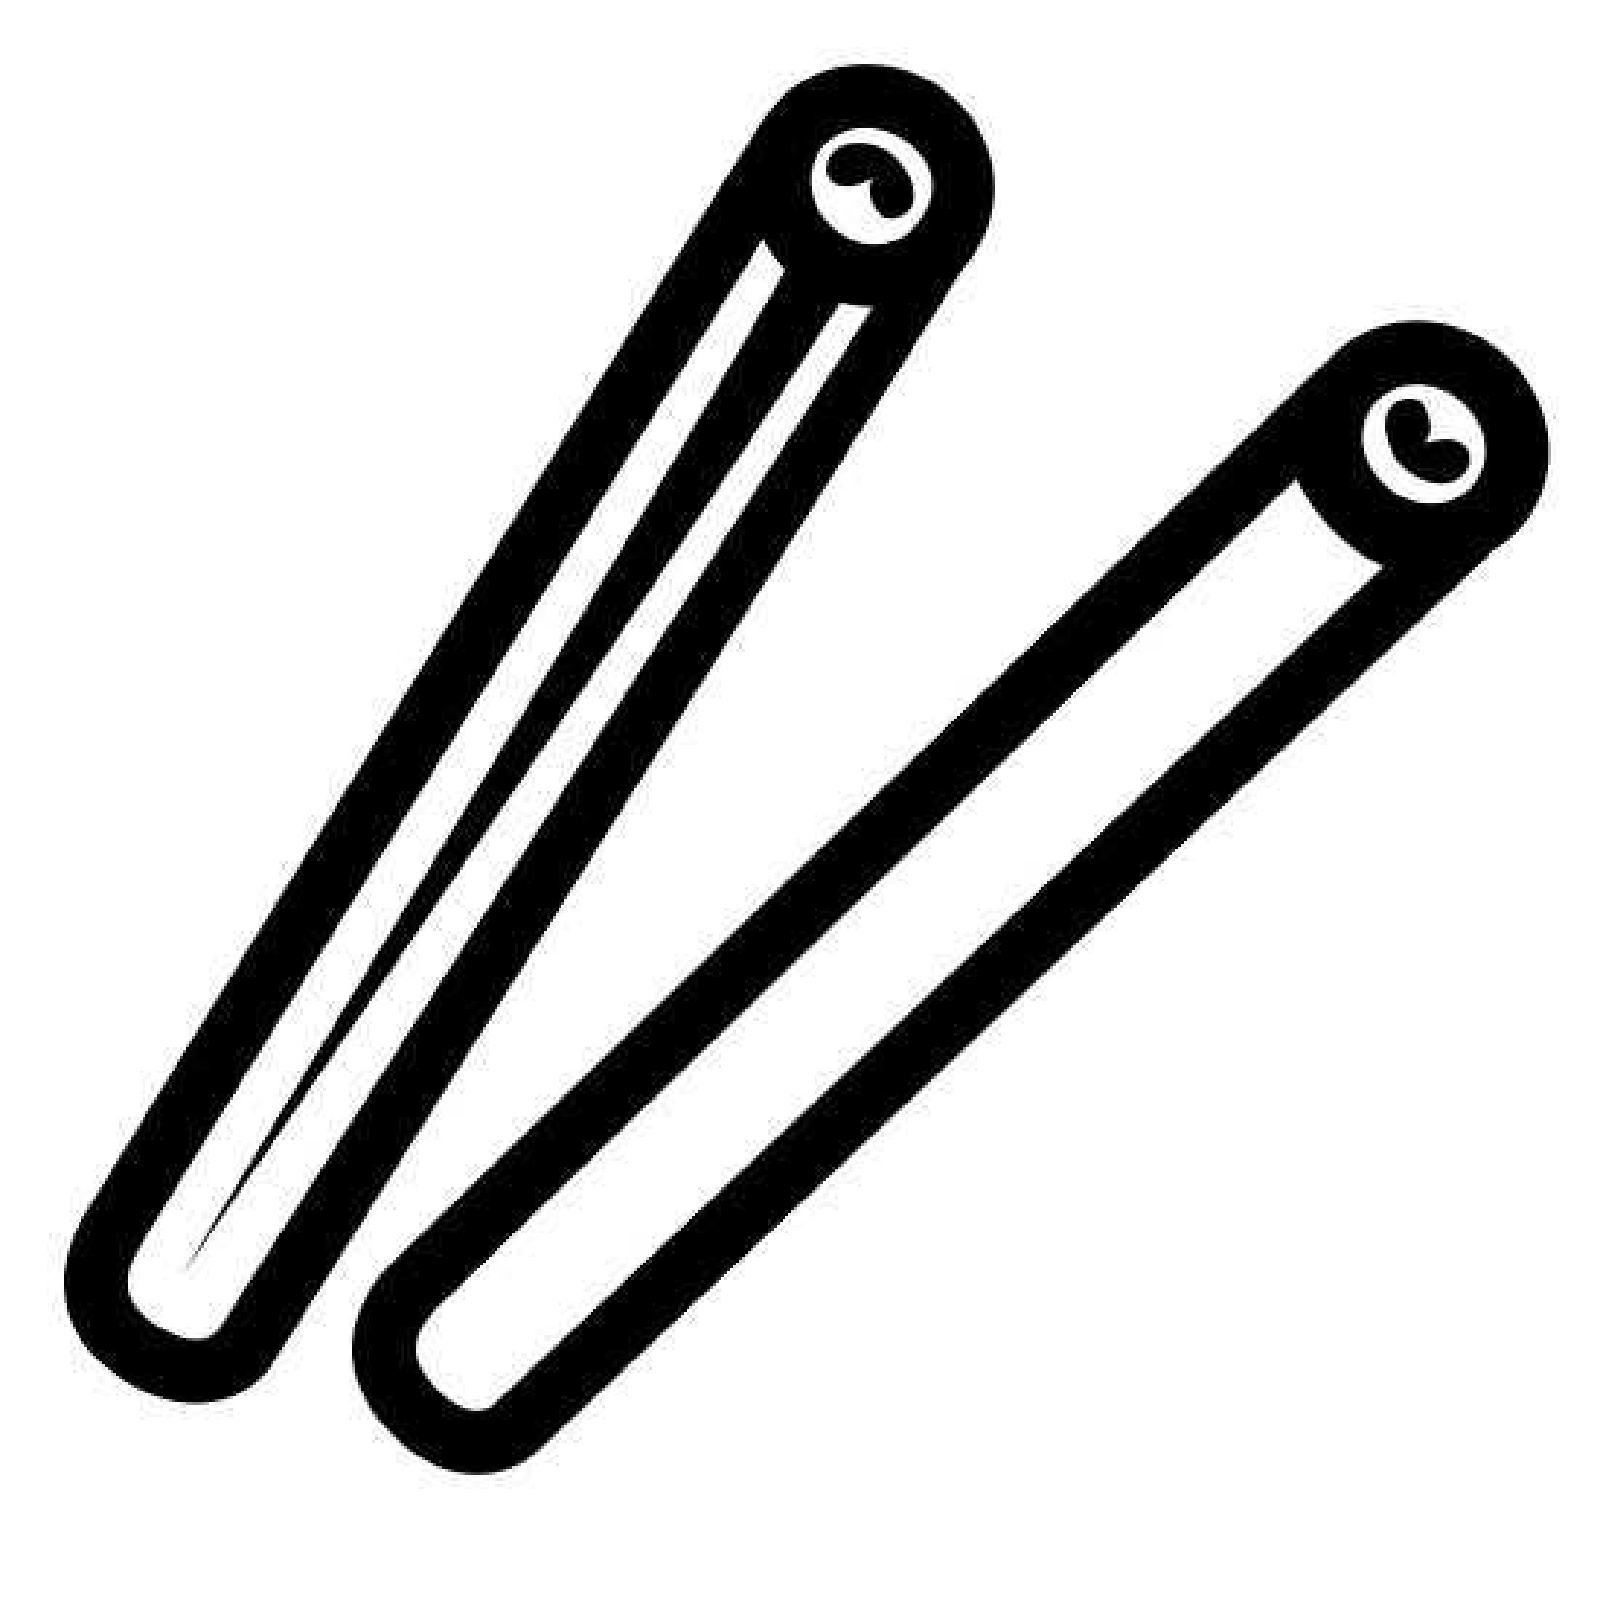 Cinnamon Sticks icon